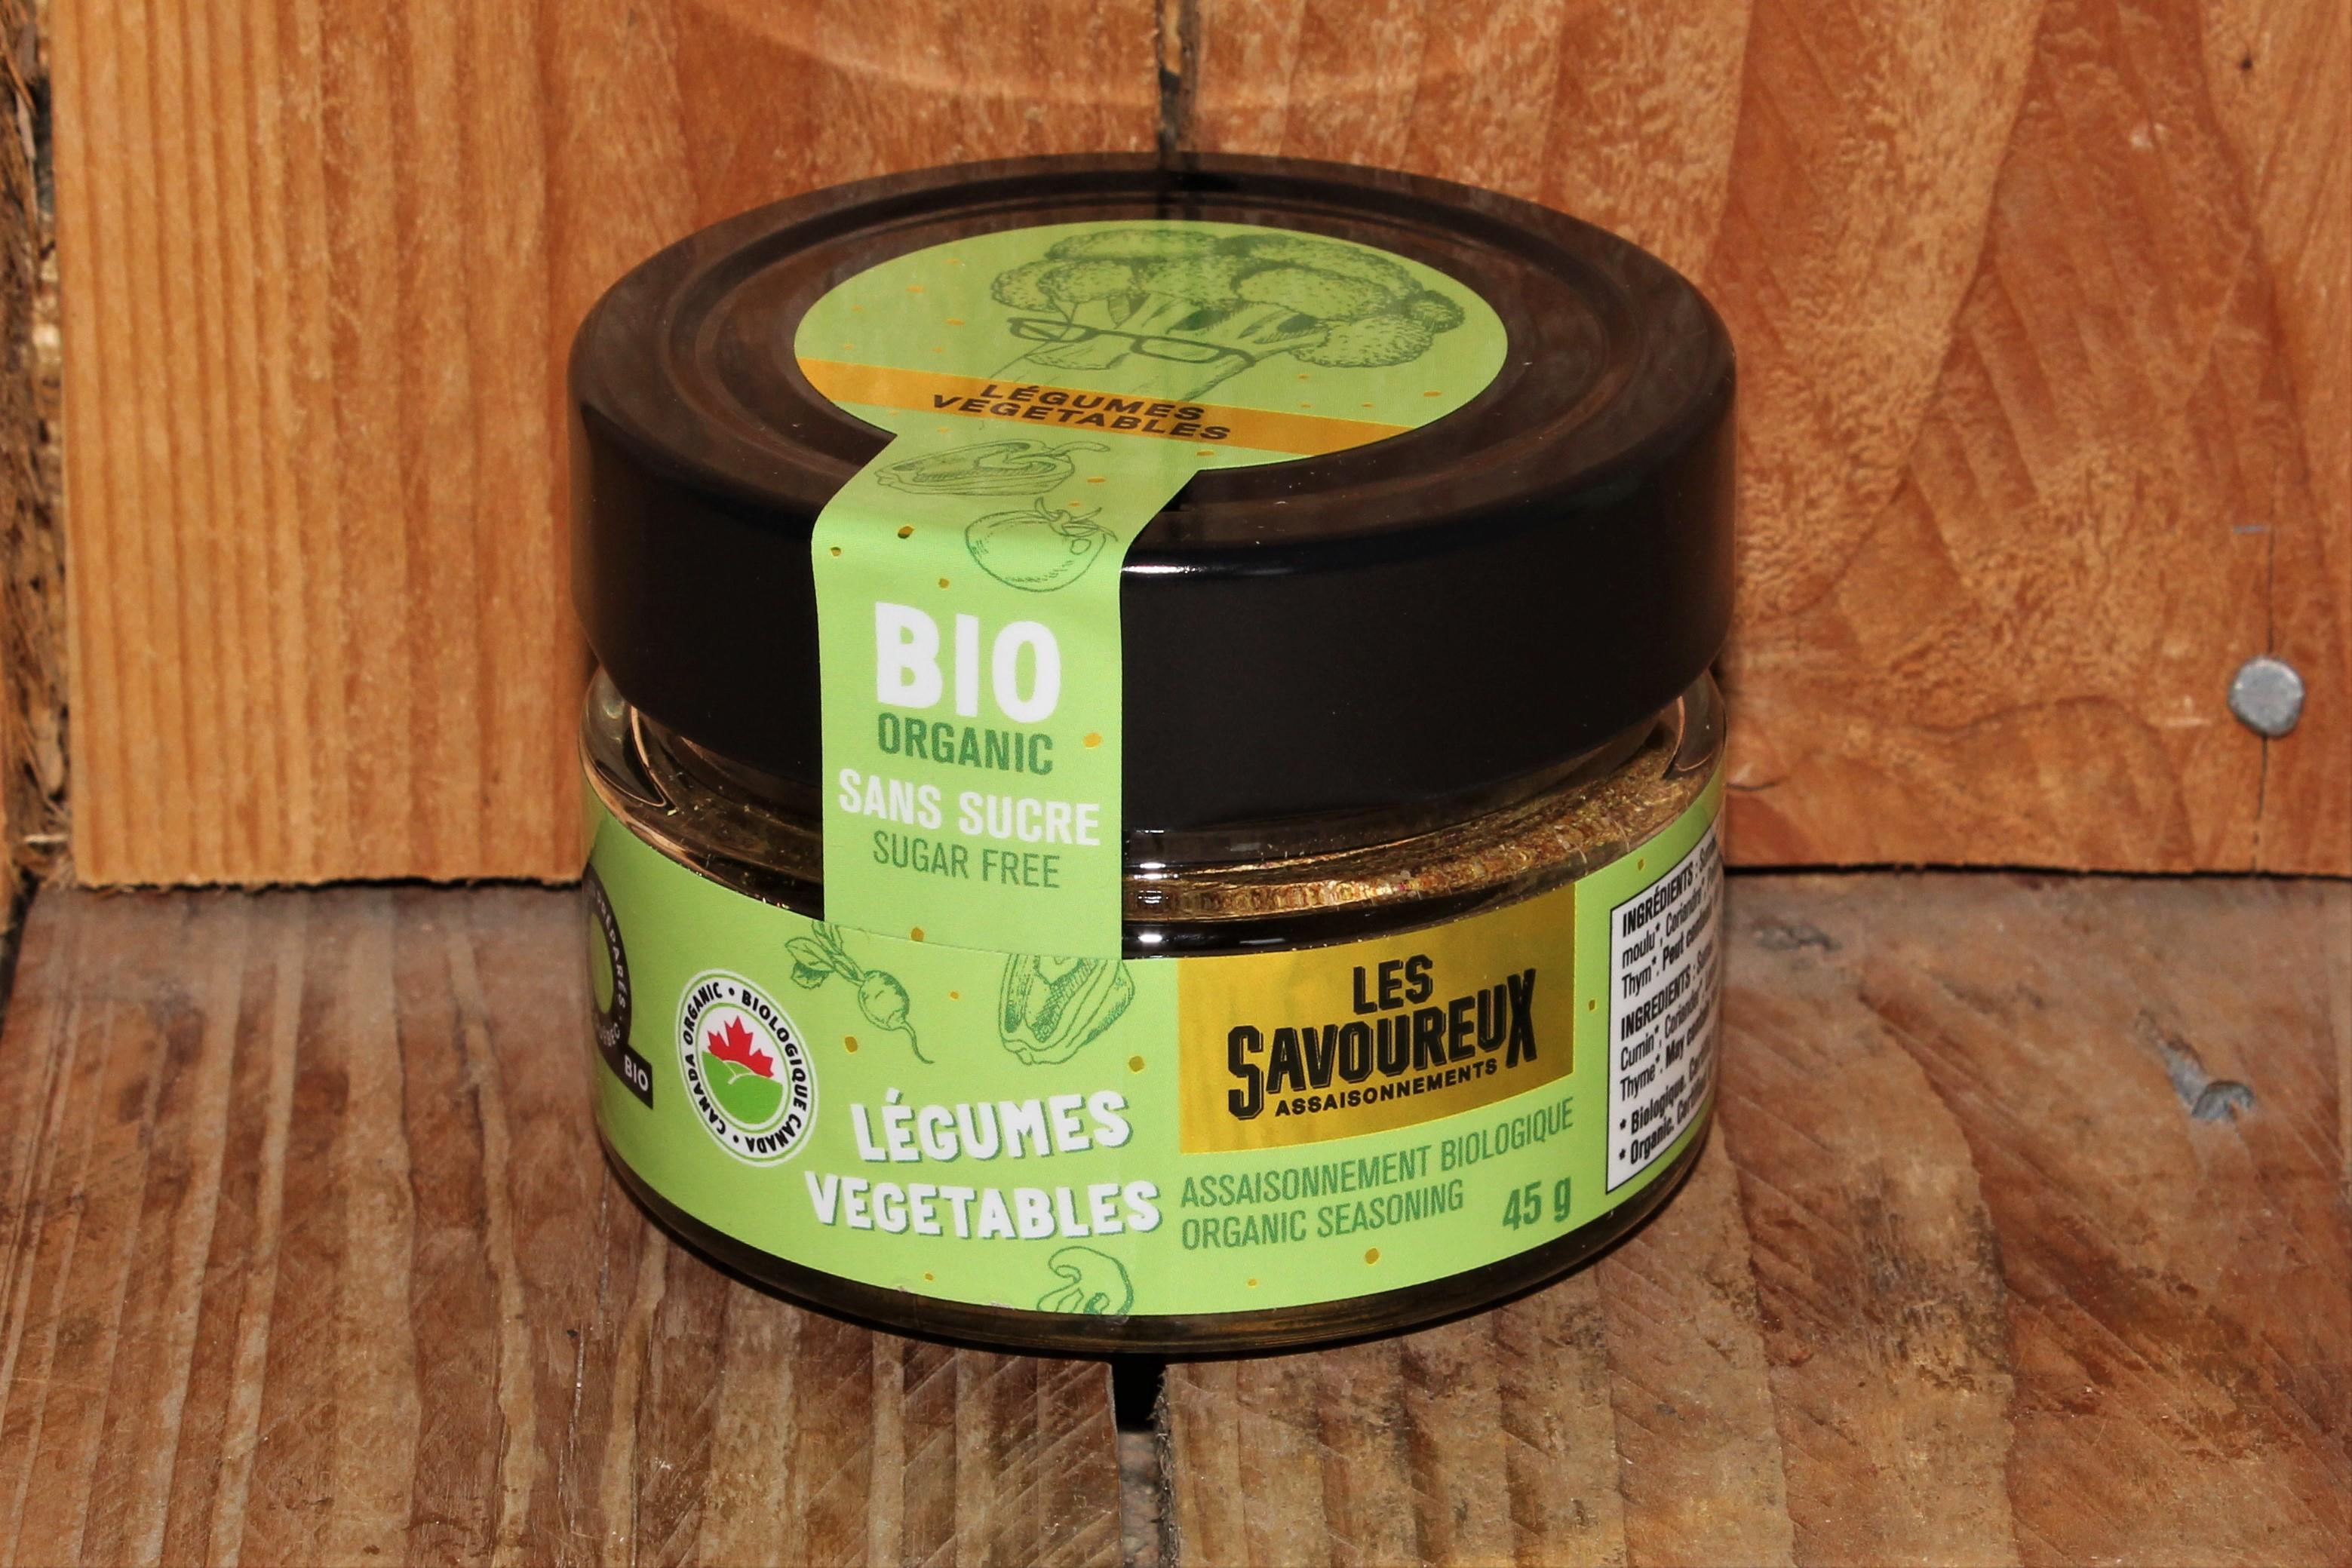 Les Savoureux – Oragnic seasoning, Vegetables *sugar-free* (45g)